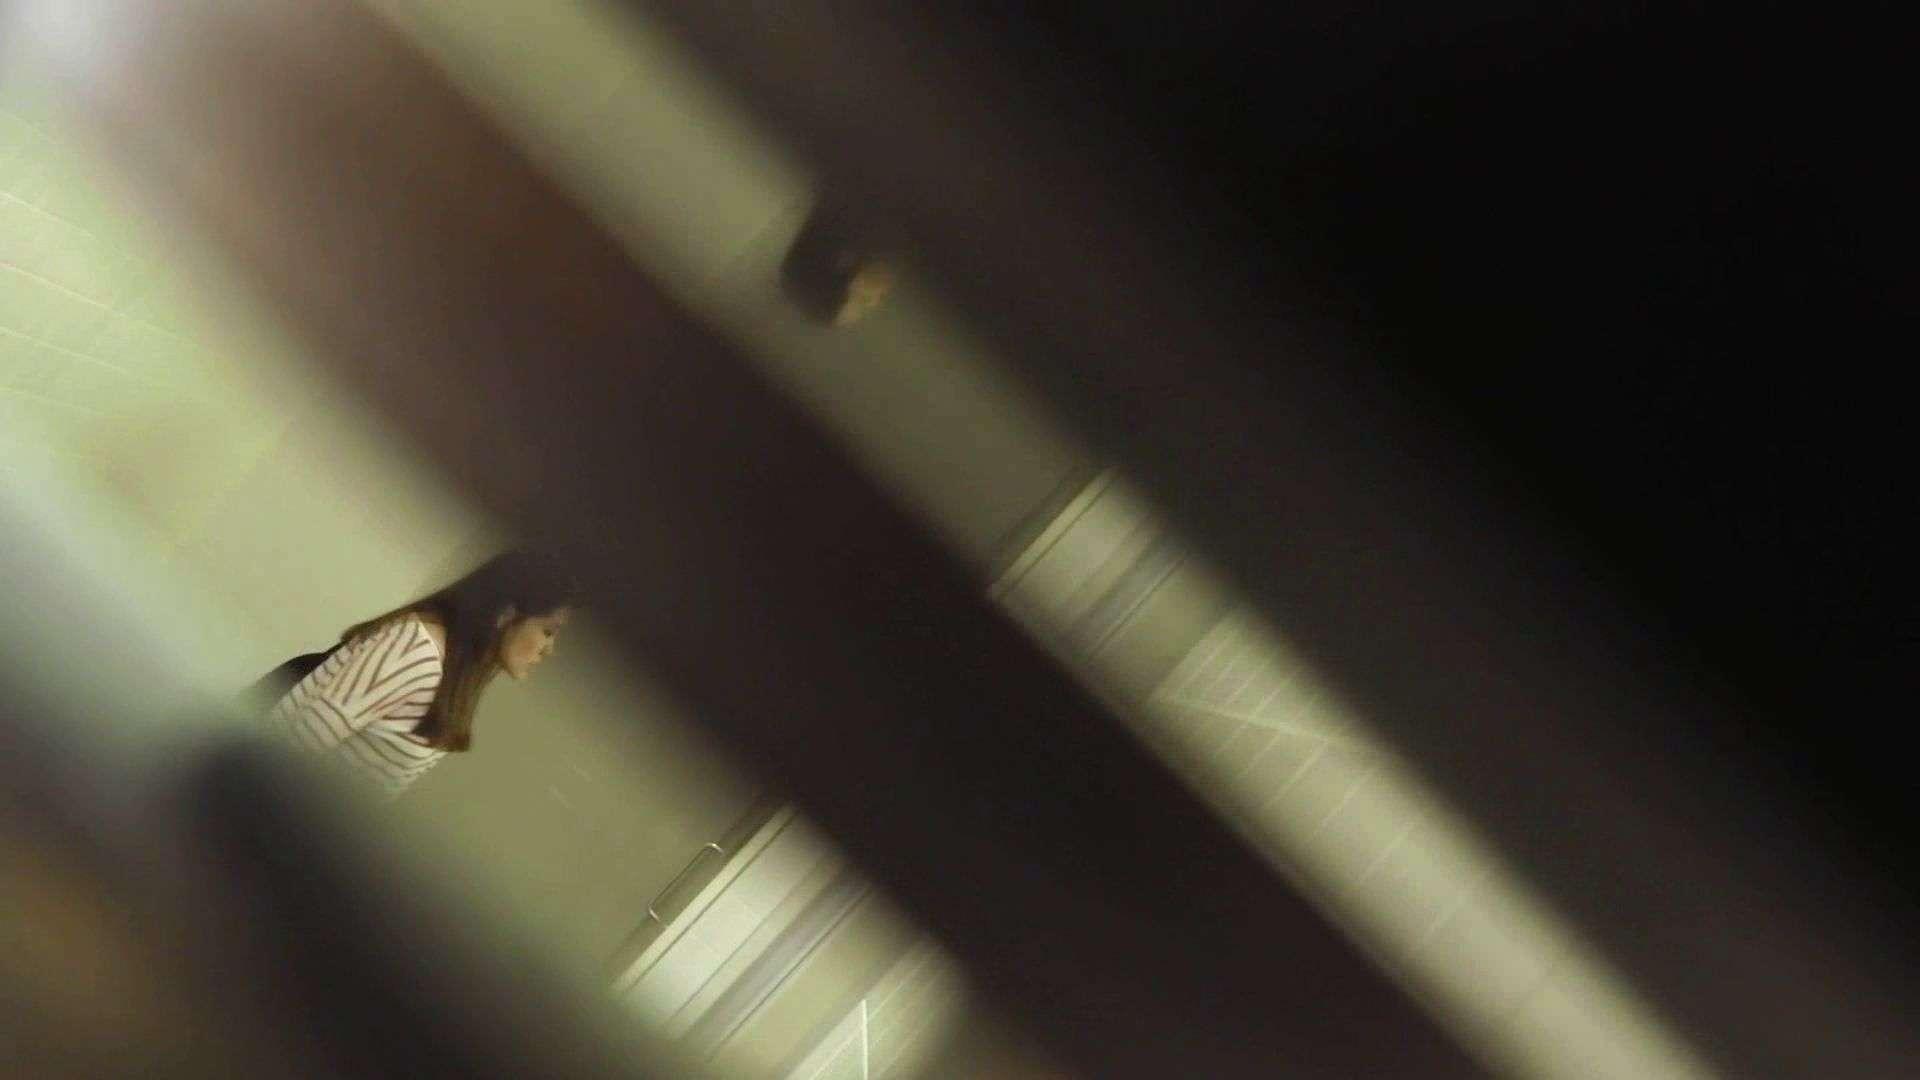 vol.27 命がけ潜伏洗面所! 小嶋陽菜似のピンクオシャレさん 美しいOLの裸体  101pic 66